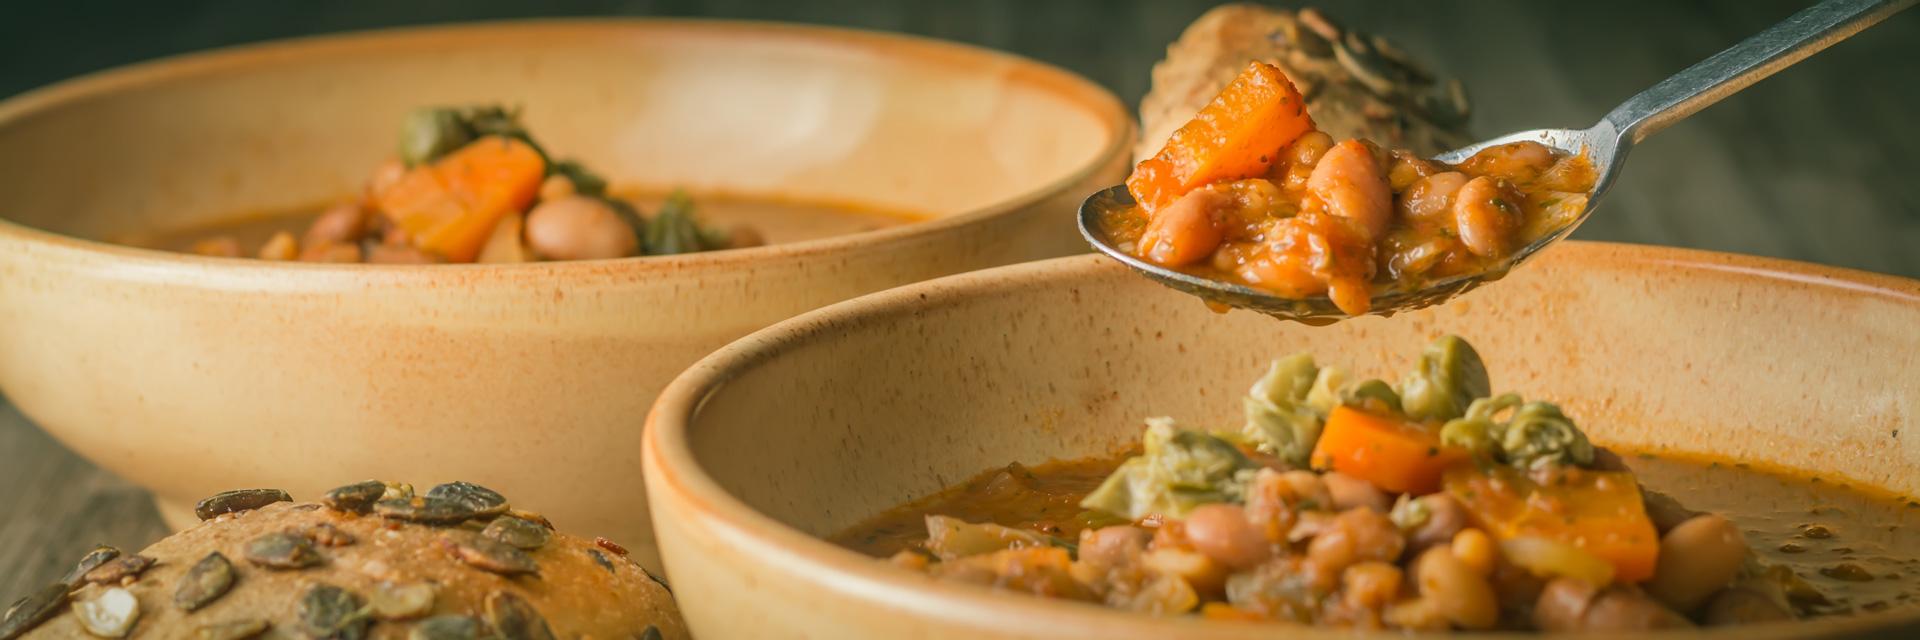 Hearty Crockpot Bean Soup